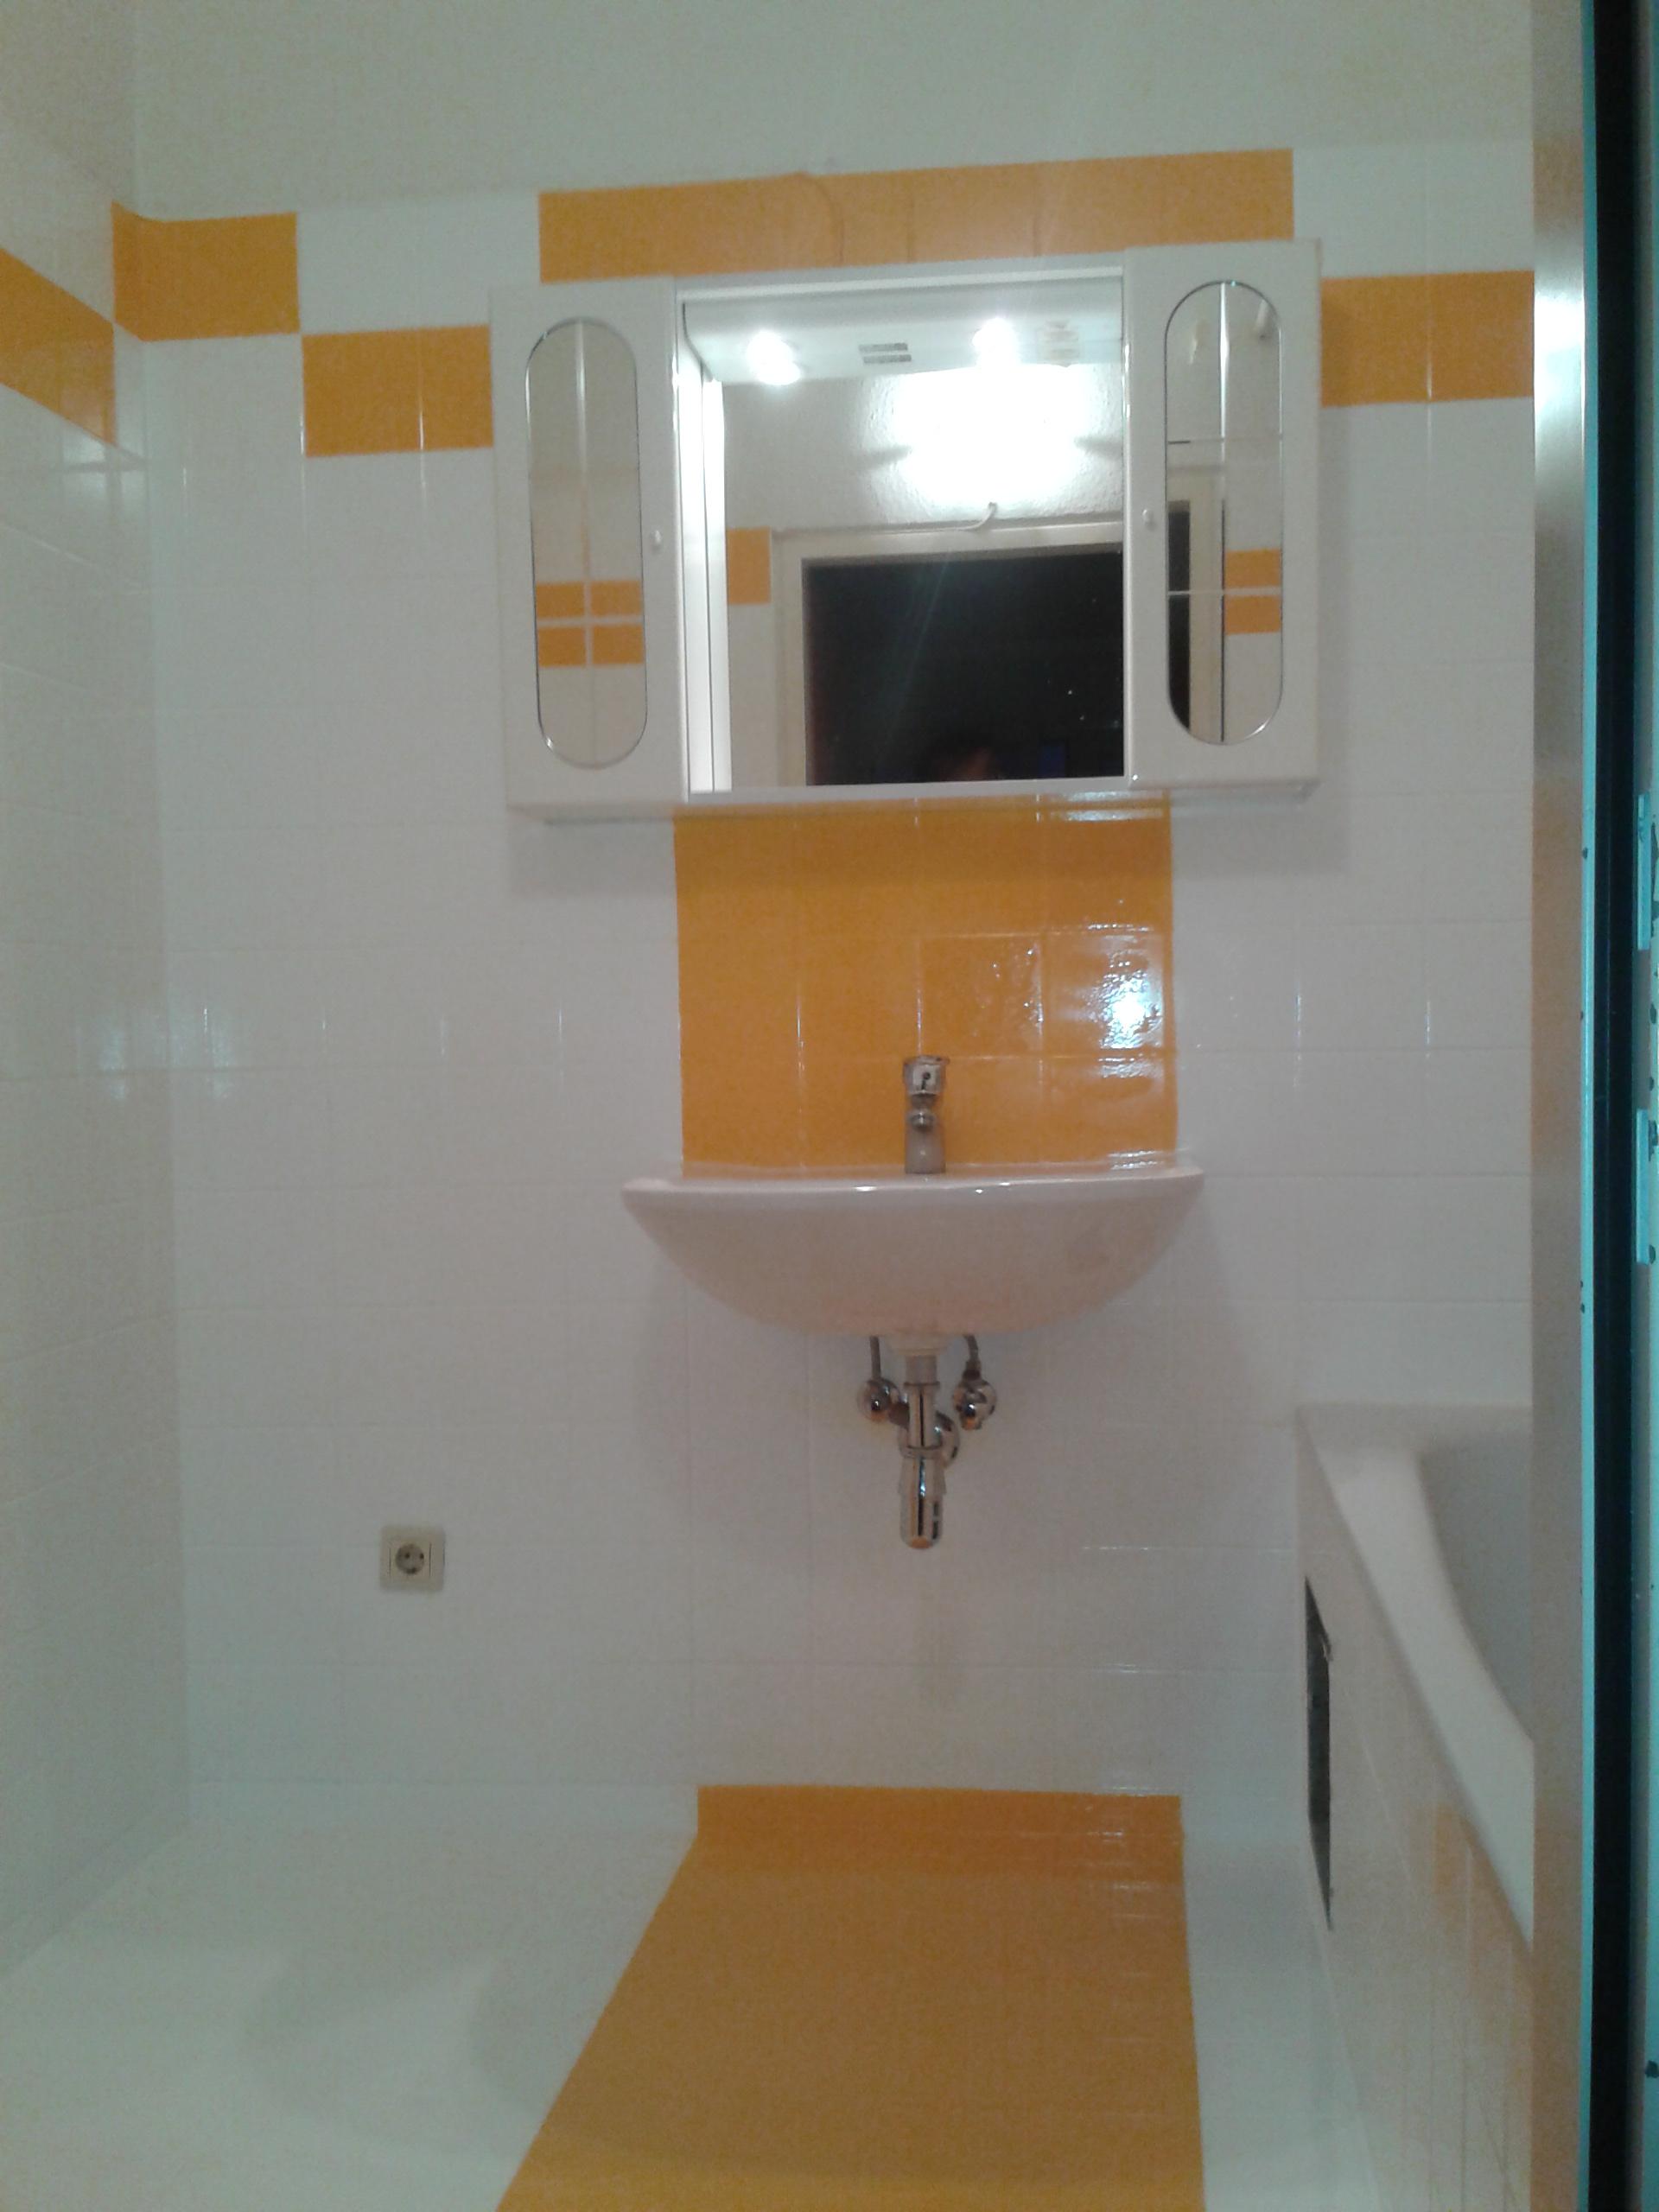 Badezimmer nachher